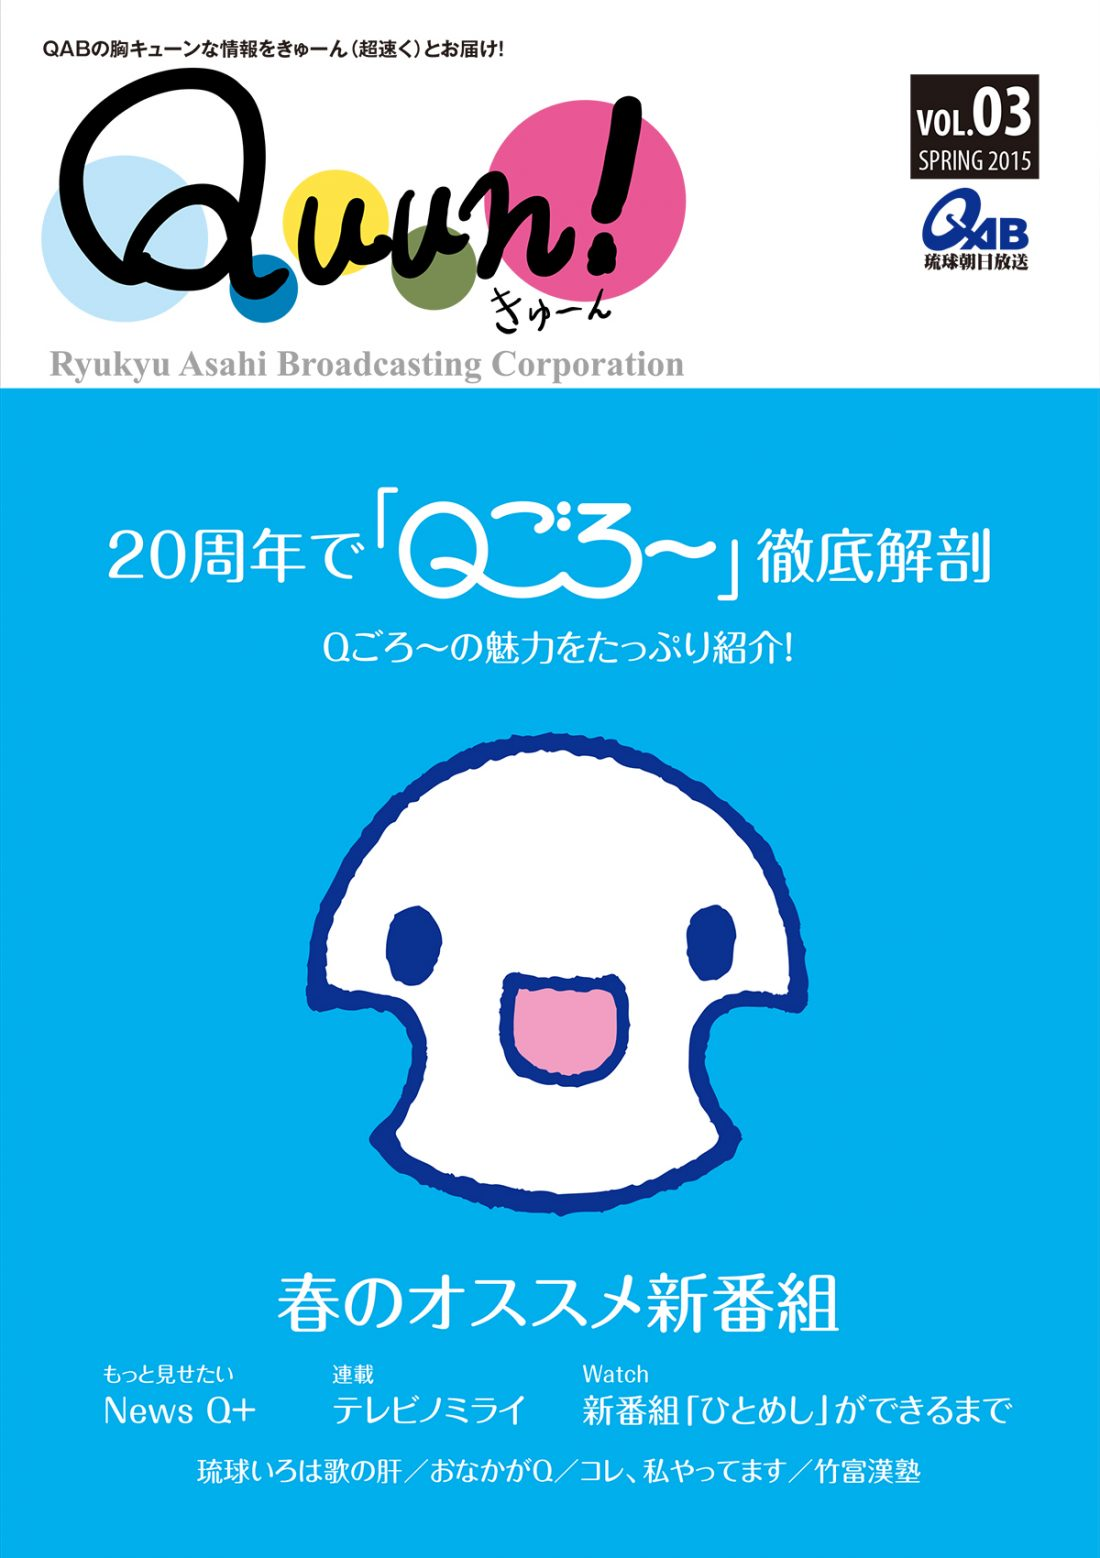 http://www.qab.co.jp/qgoro/wp-content/uploads/quun_0301-1100x1558.jpg